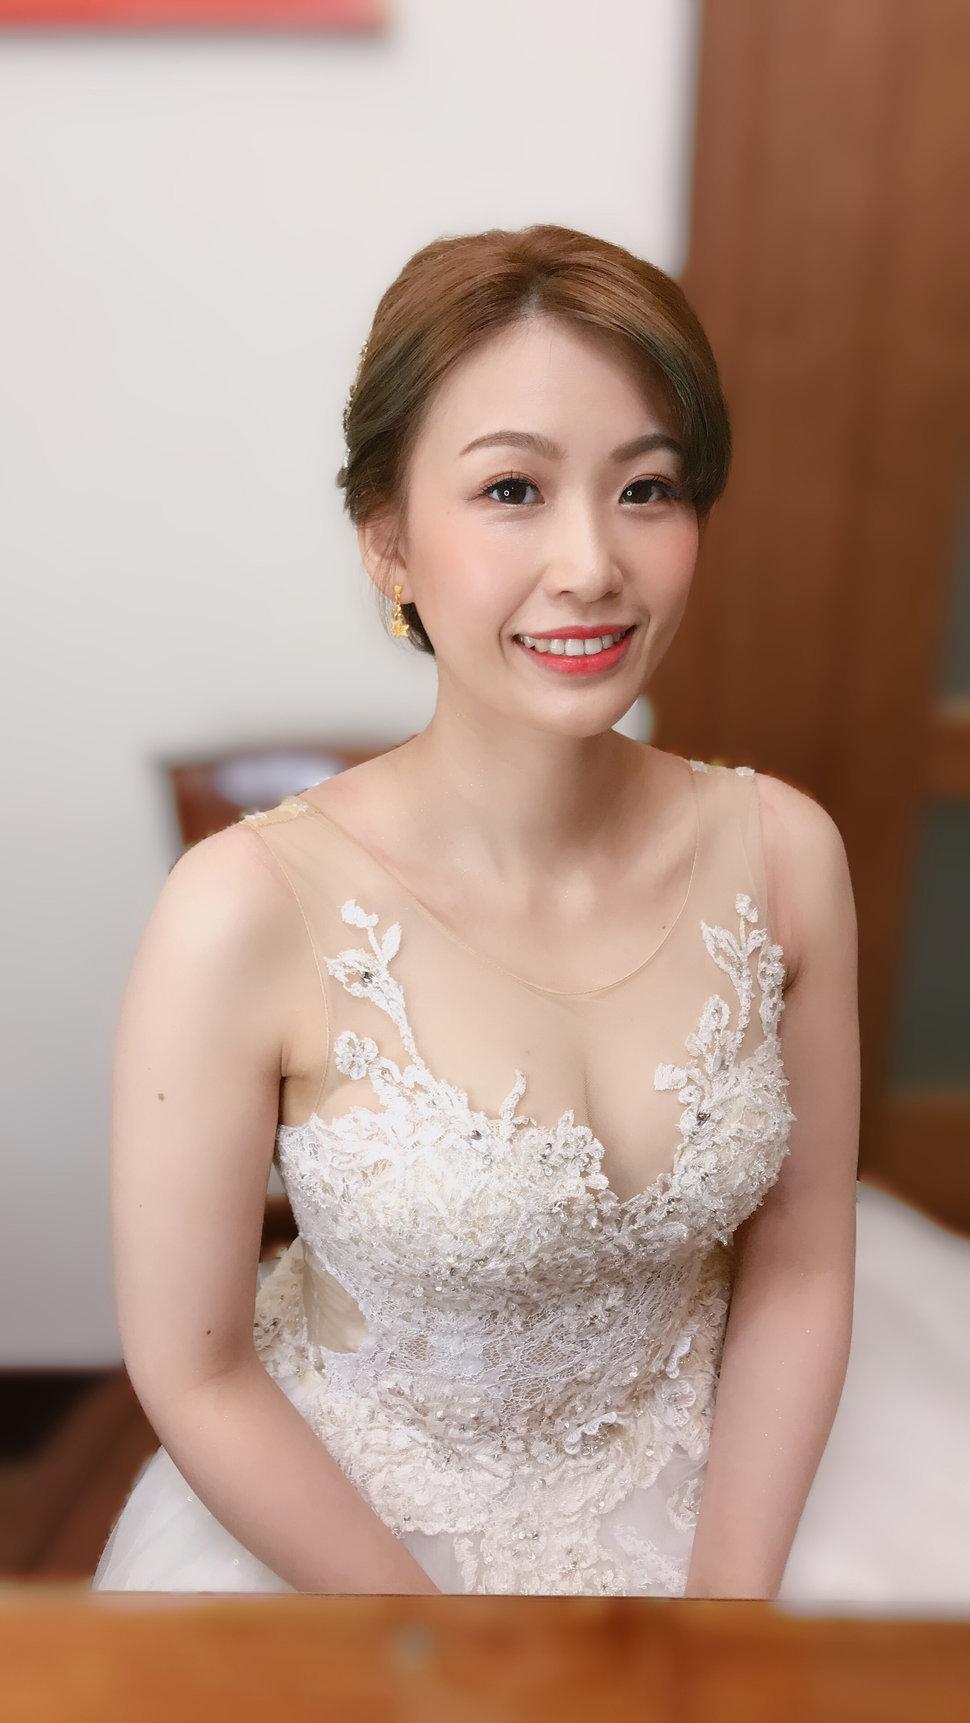 2A3394E6-FDE7-467C-A4CC-BCD3566628ED - 幫您  Bonnie make up《結婚吧》